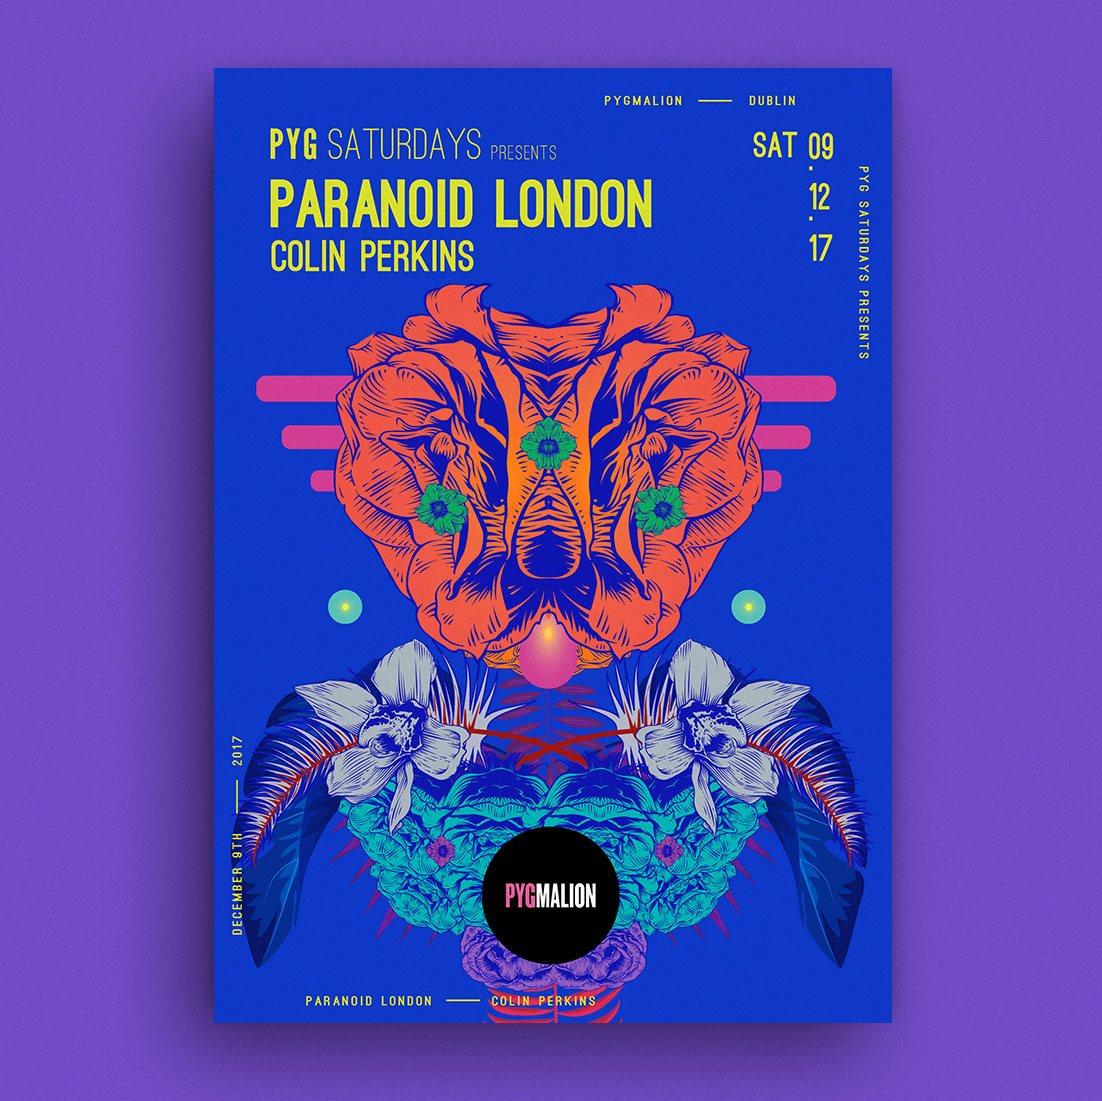 Pyg presents Paranoid London - Flyer front